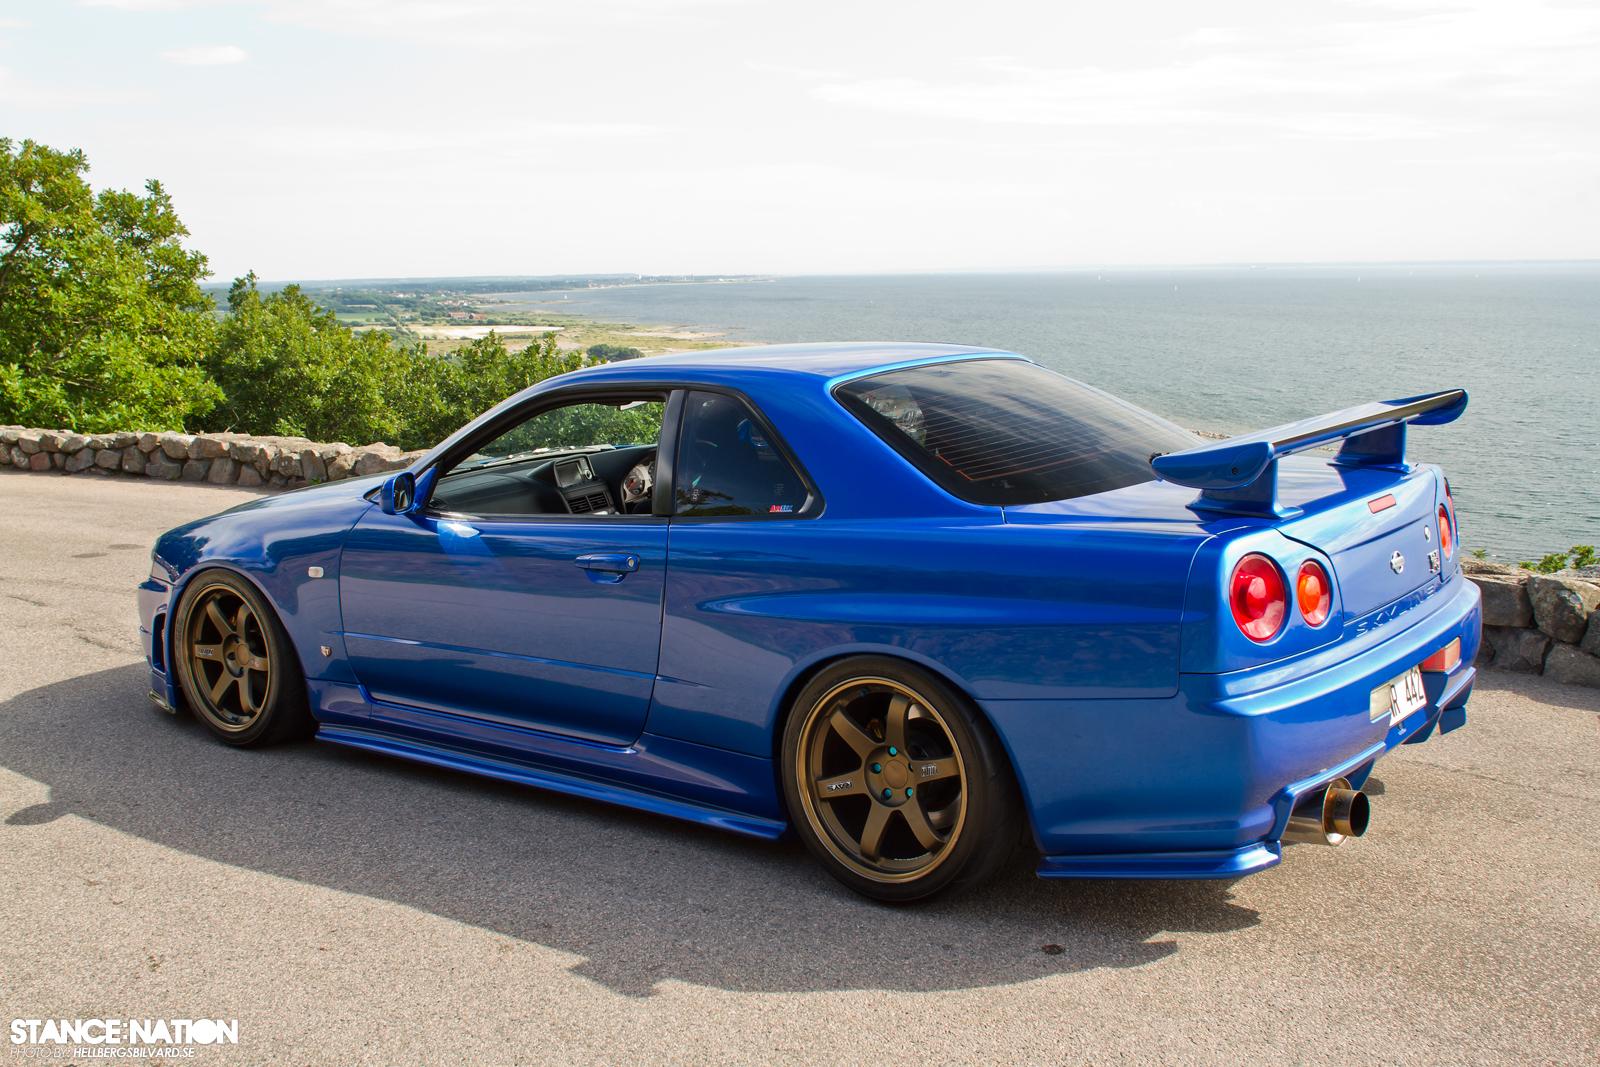 4Tuning » Poze masini » Masini Tunate » Nissan Skyline R34 GT-R ...